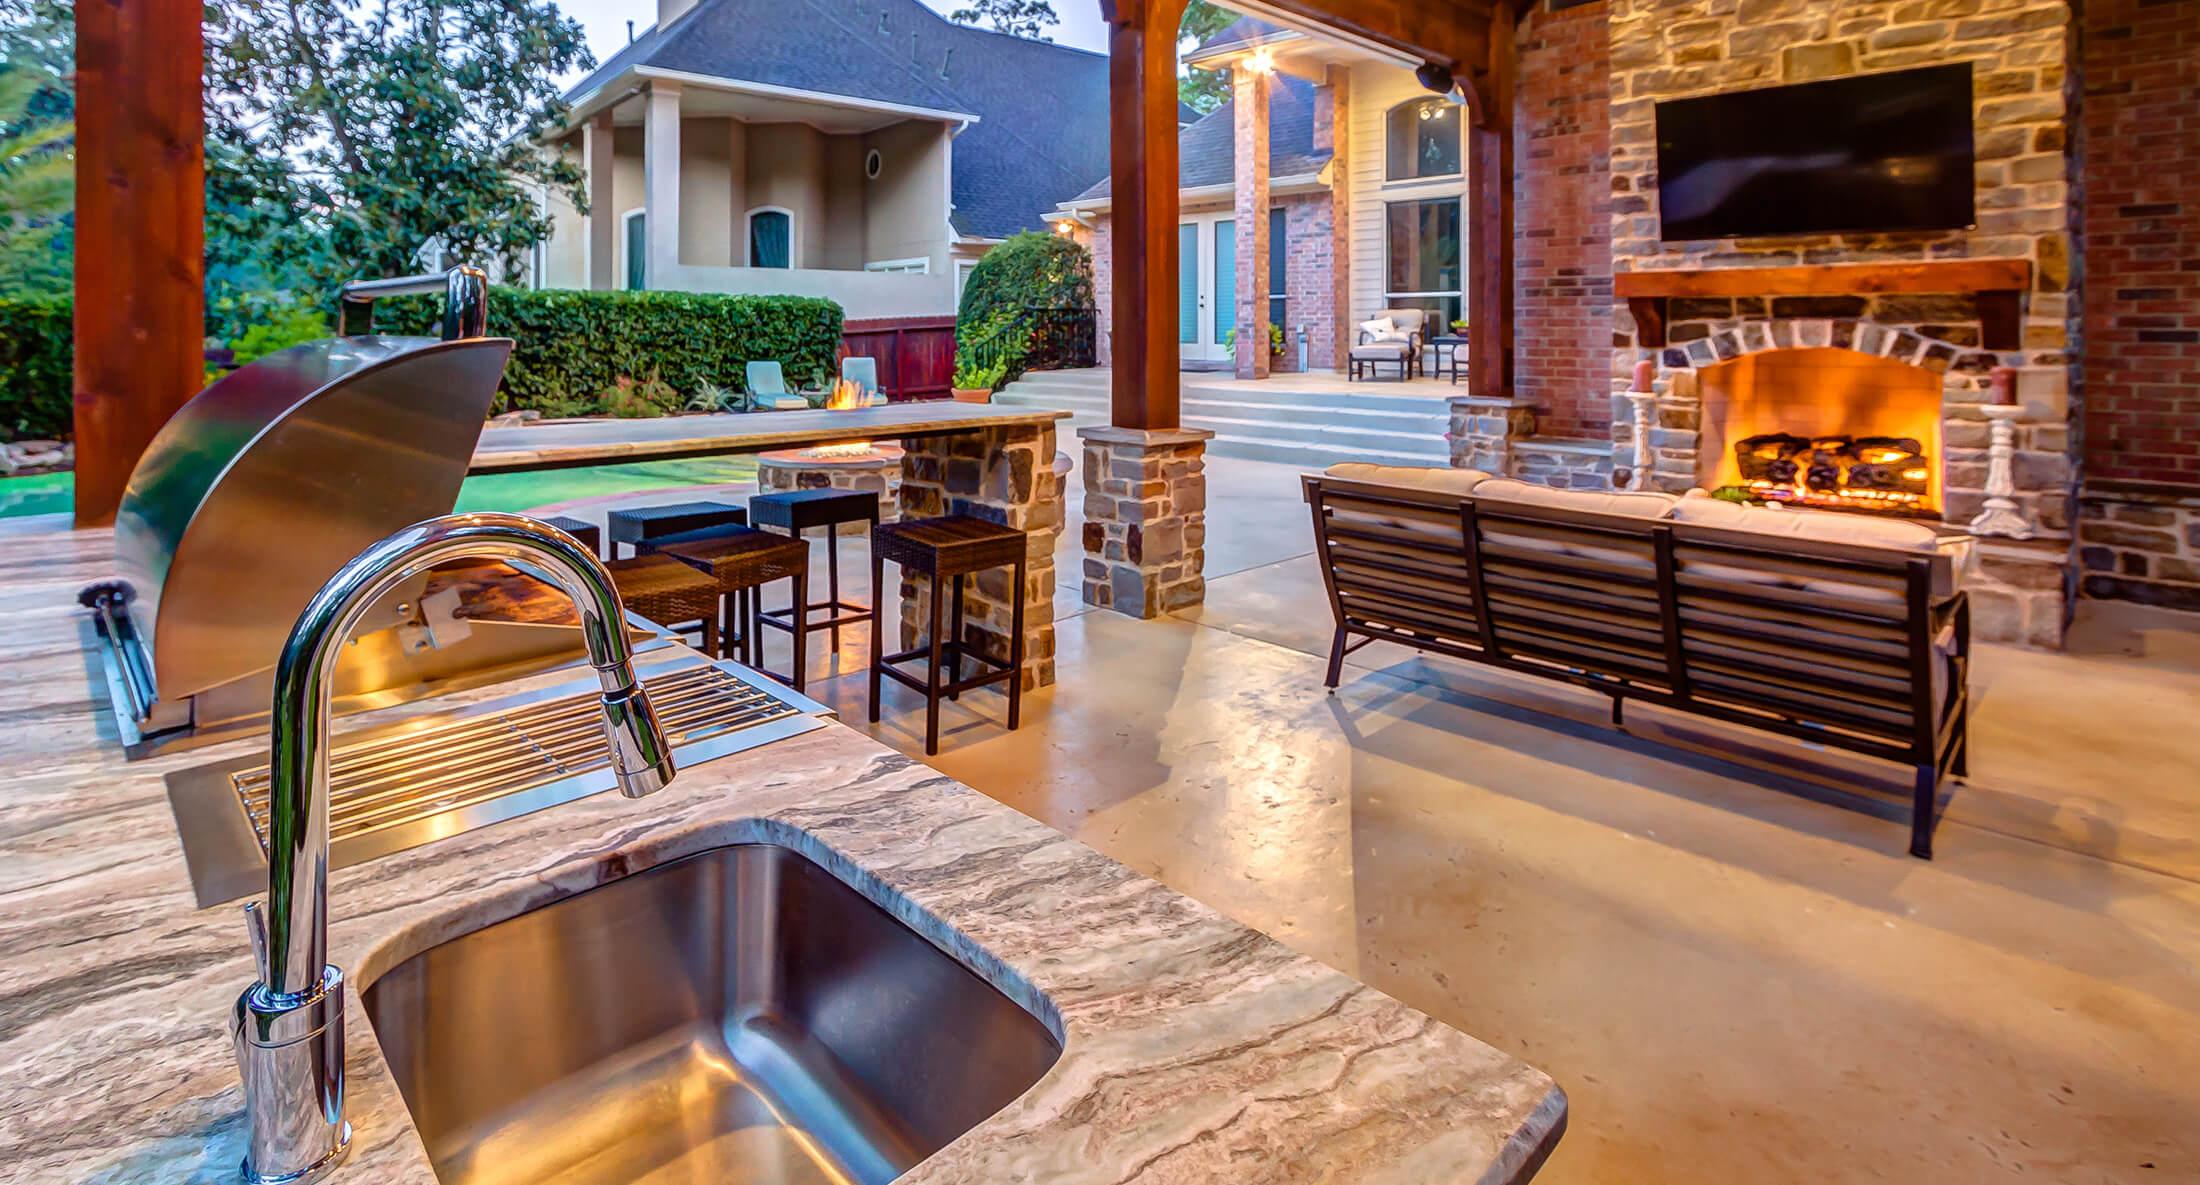 Houston Outdoor Kitchen Design Inspiration Creekstone Outdoor Living Creekstone Outdoor Living